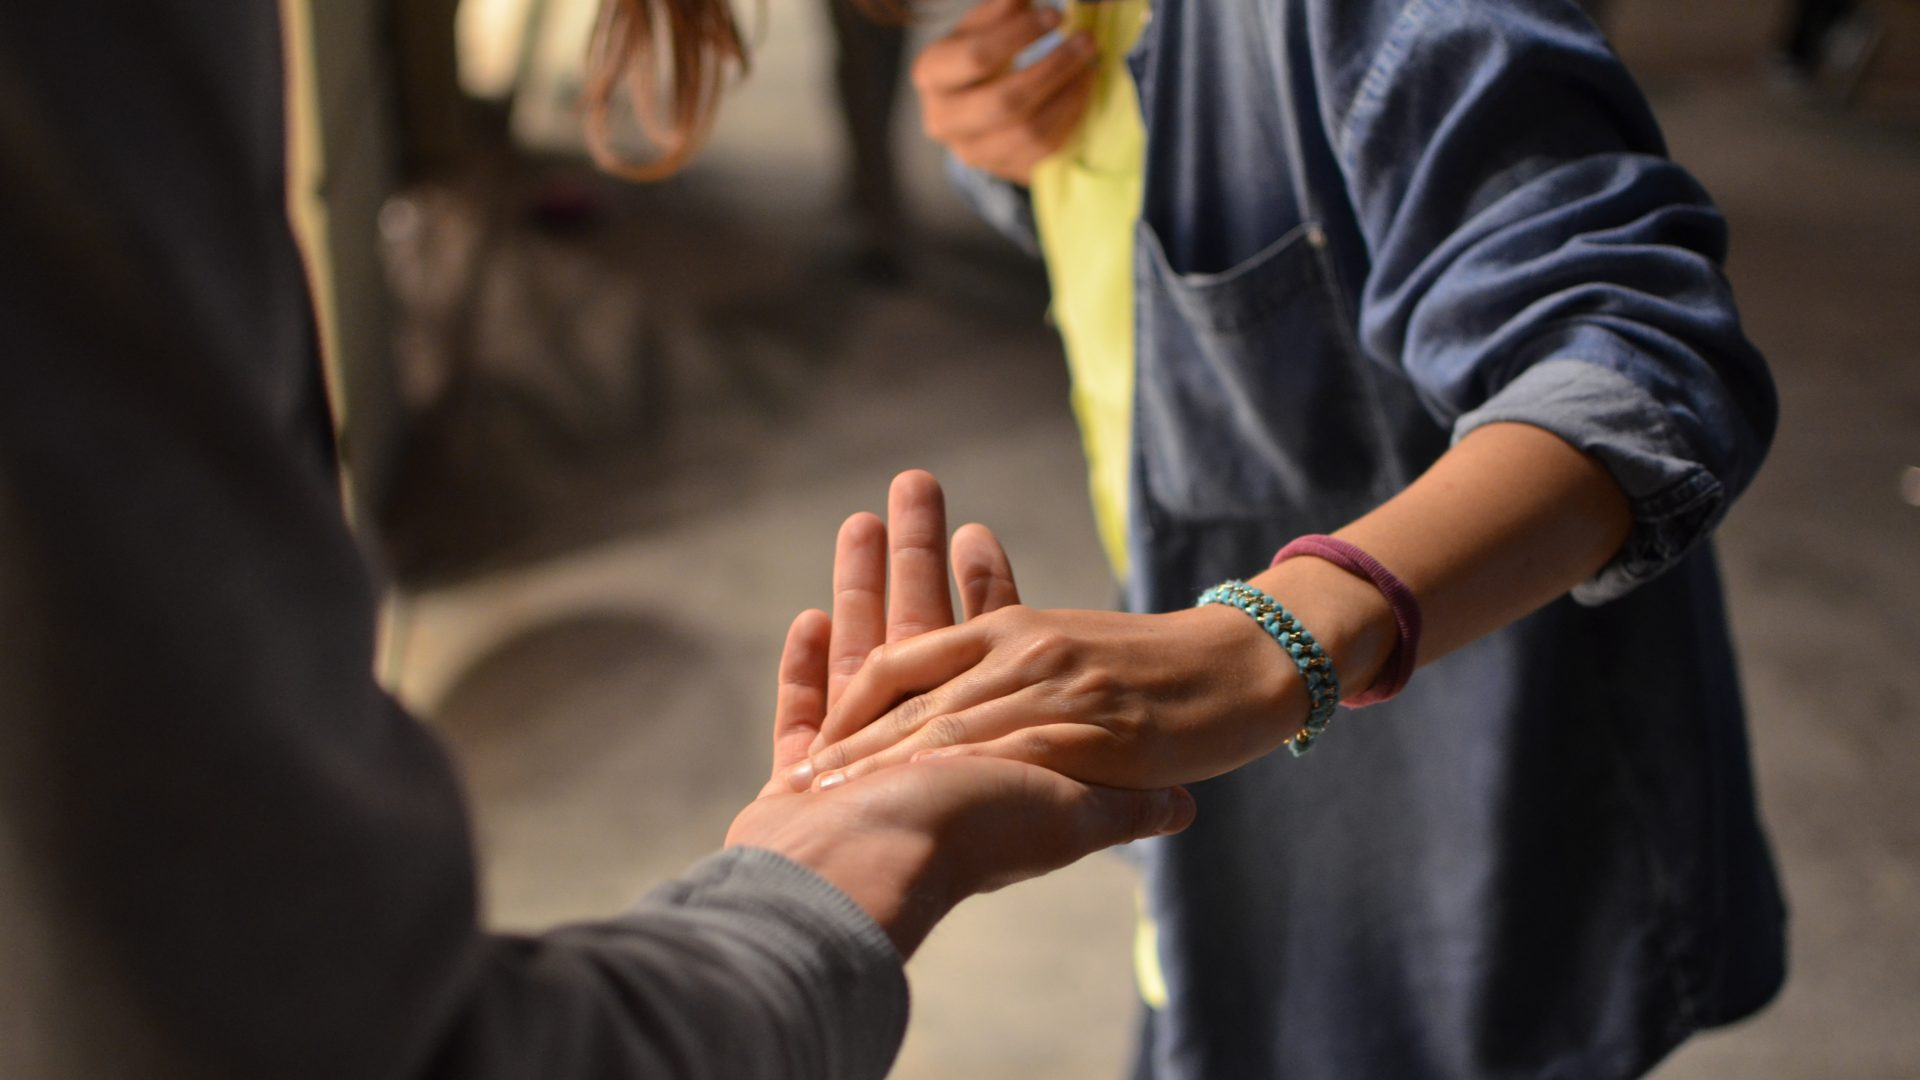 Center for Reuniting Families